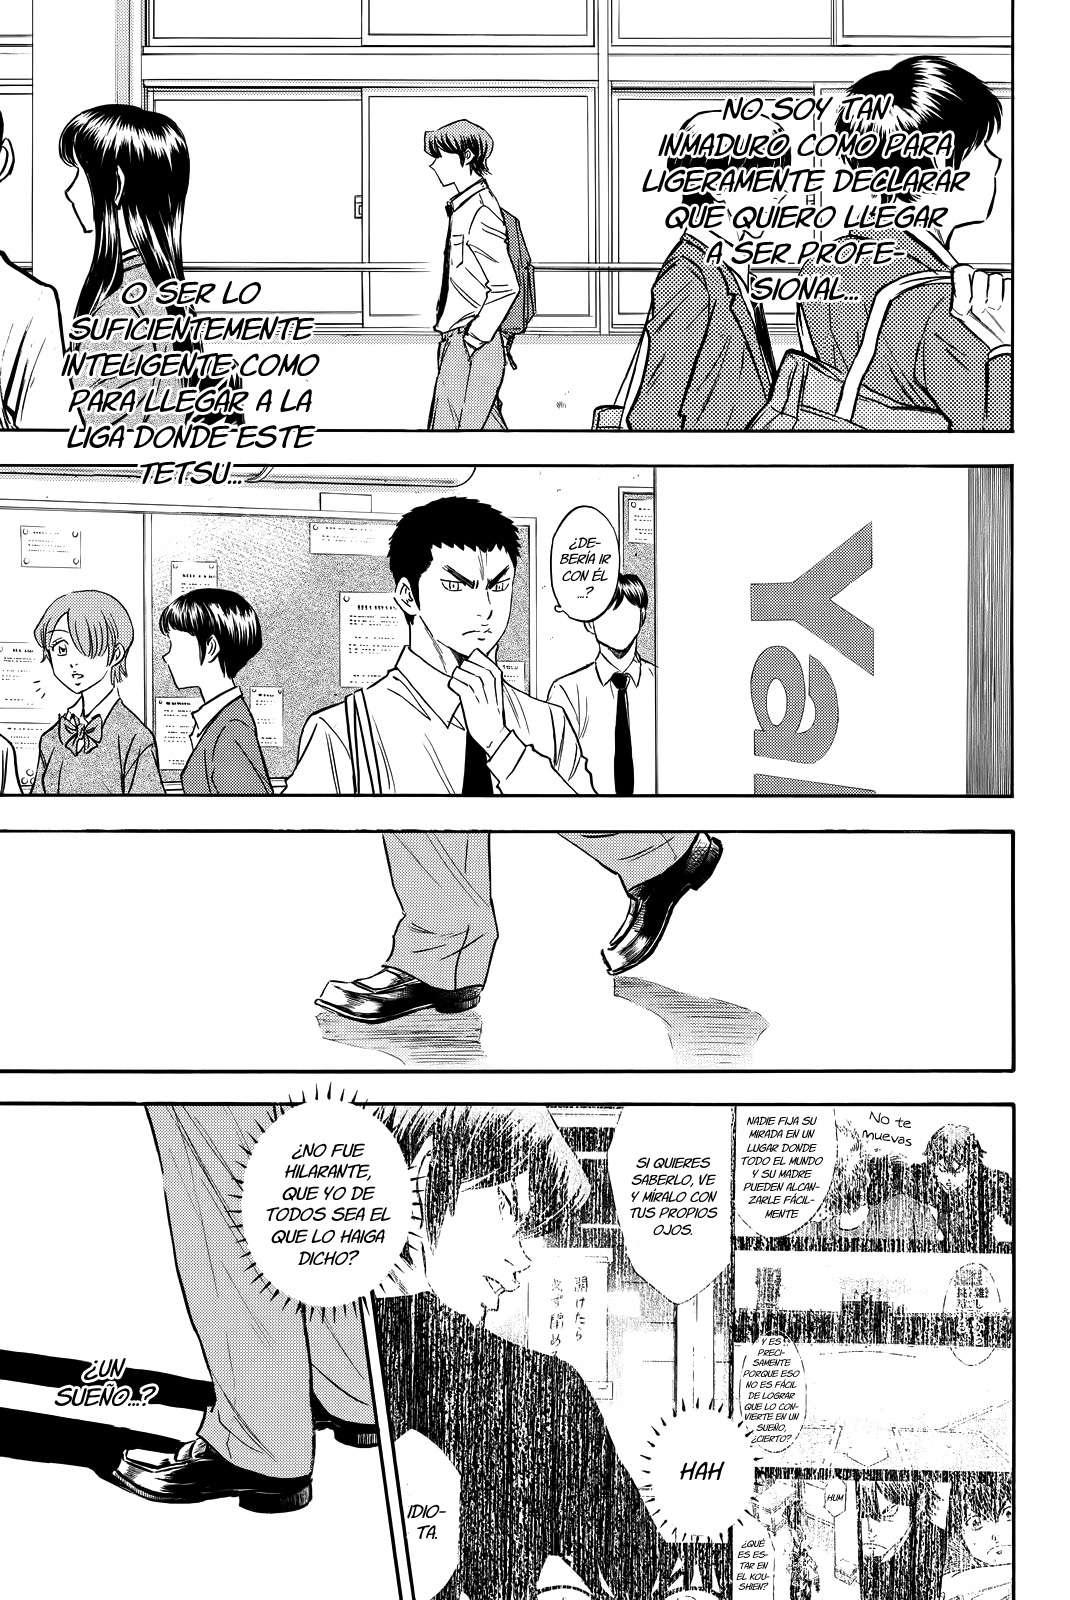 http://c5.ninemanga.com/es_manga/24/1752/416097/45d77b8a40a2dcc87d0b55ea78dfa4f8.jpg Page 10